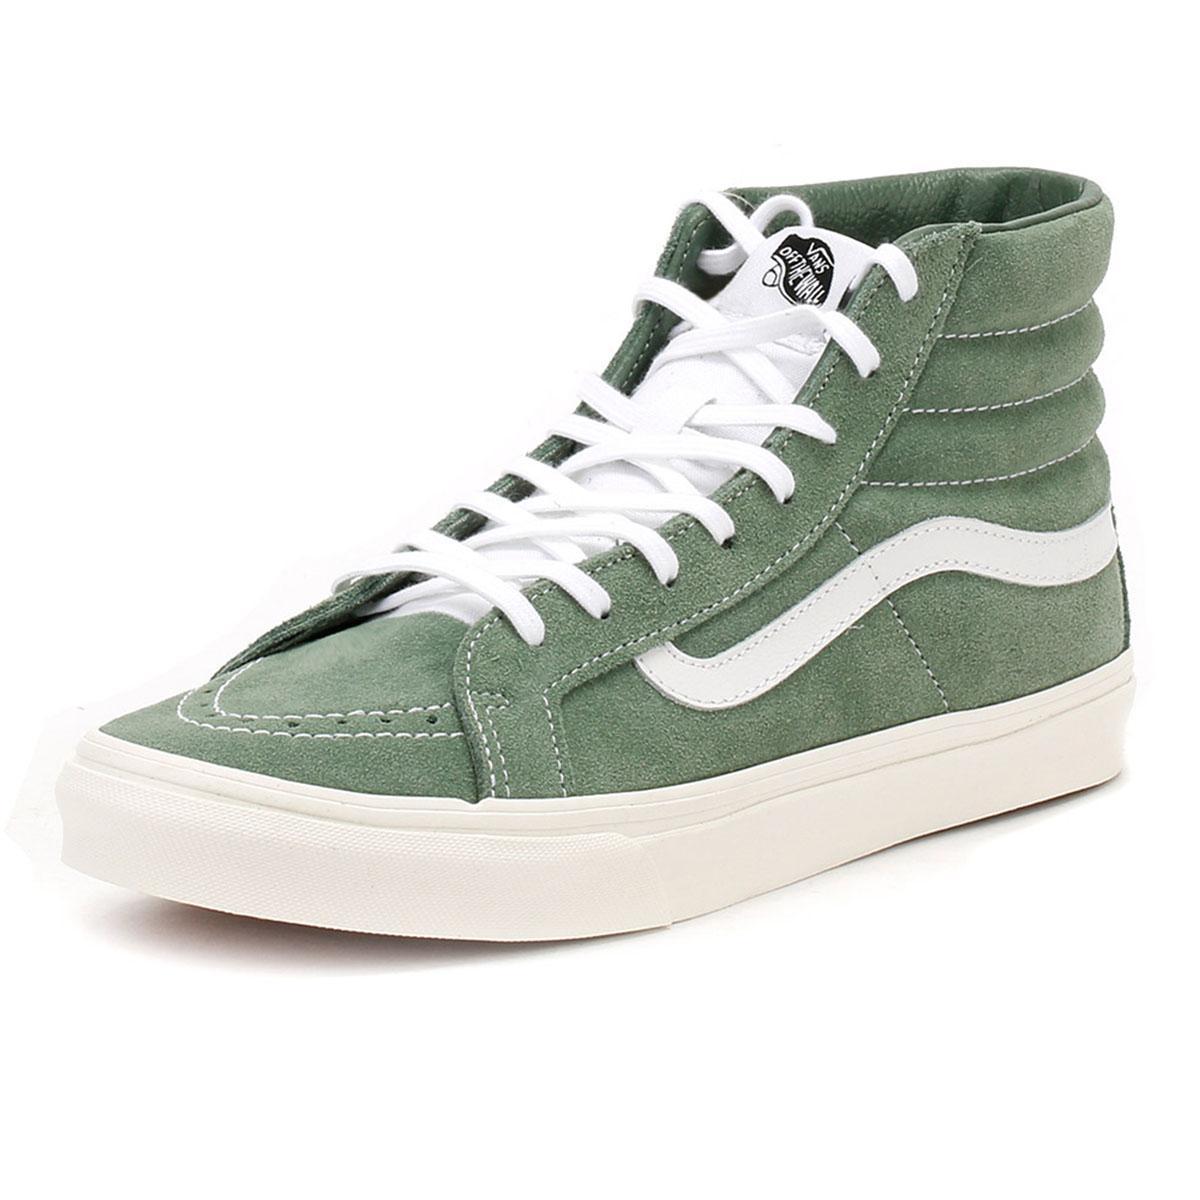 121397086afa Lyst - Vans Womens Green   True White Suede Sk8-hi Slim Trainers in ...